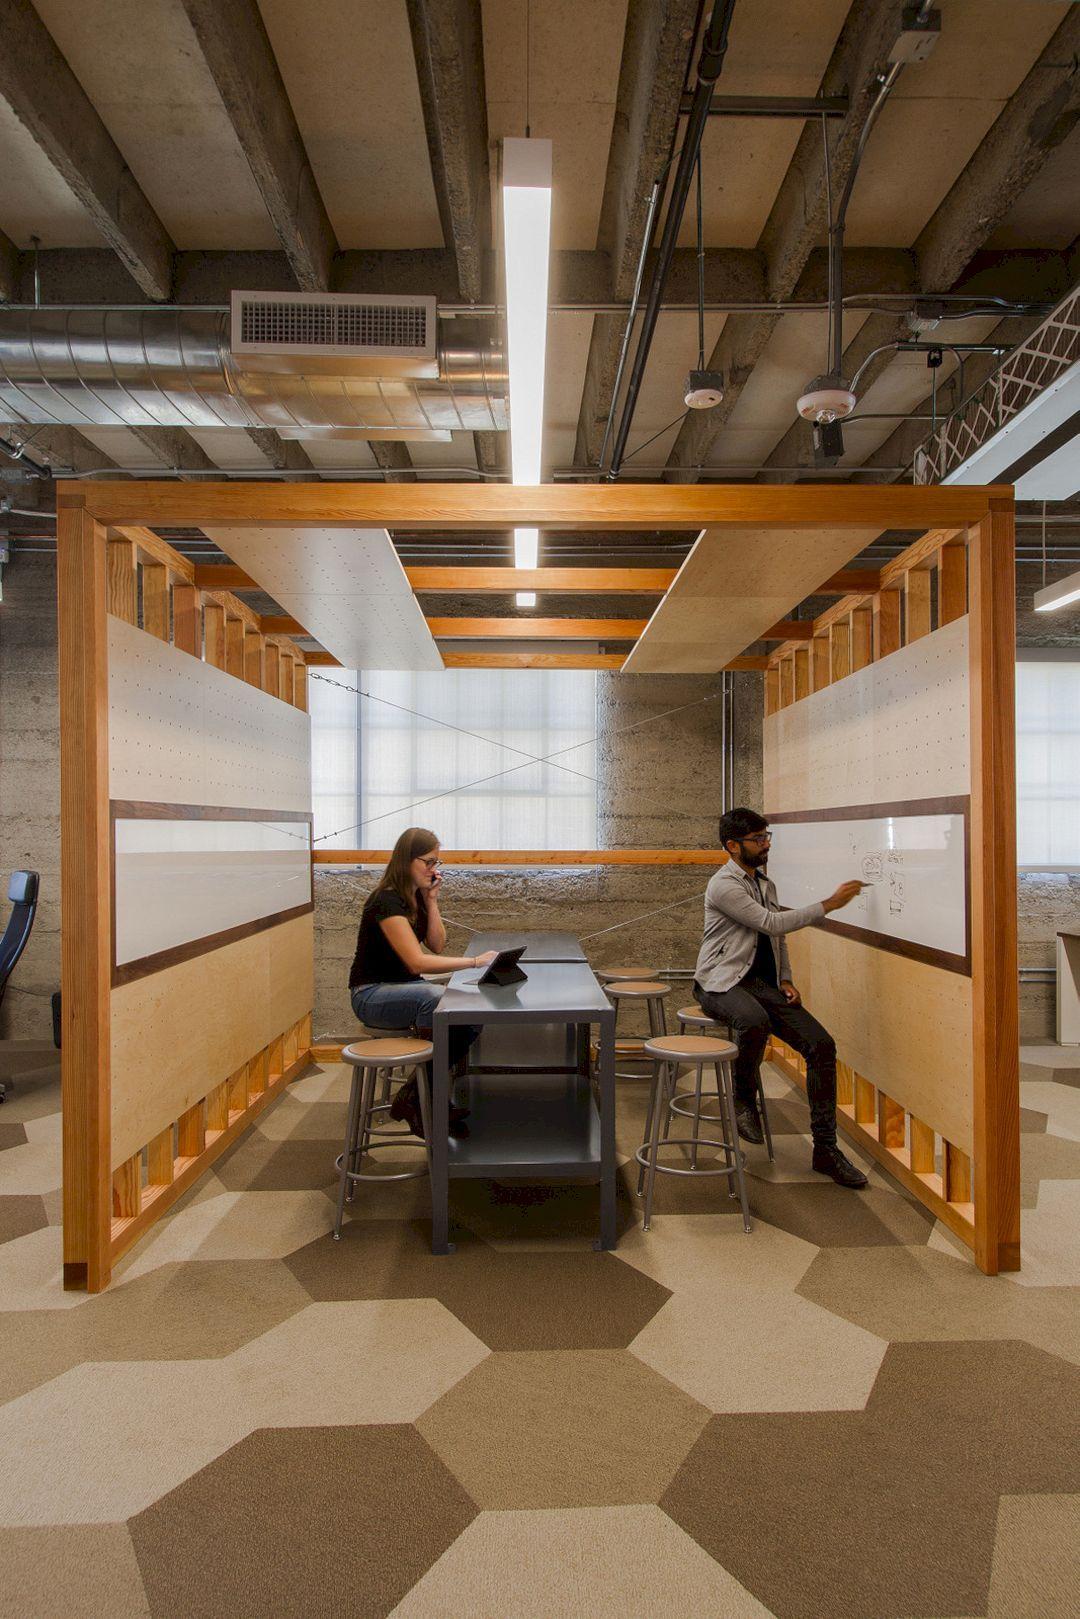 Delicieux Best Modern And Gorgeous Office Interior Design Ideas  Https://www.futuristarchitecture.com/23070 Office Interior.html